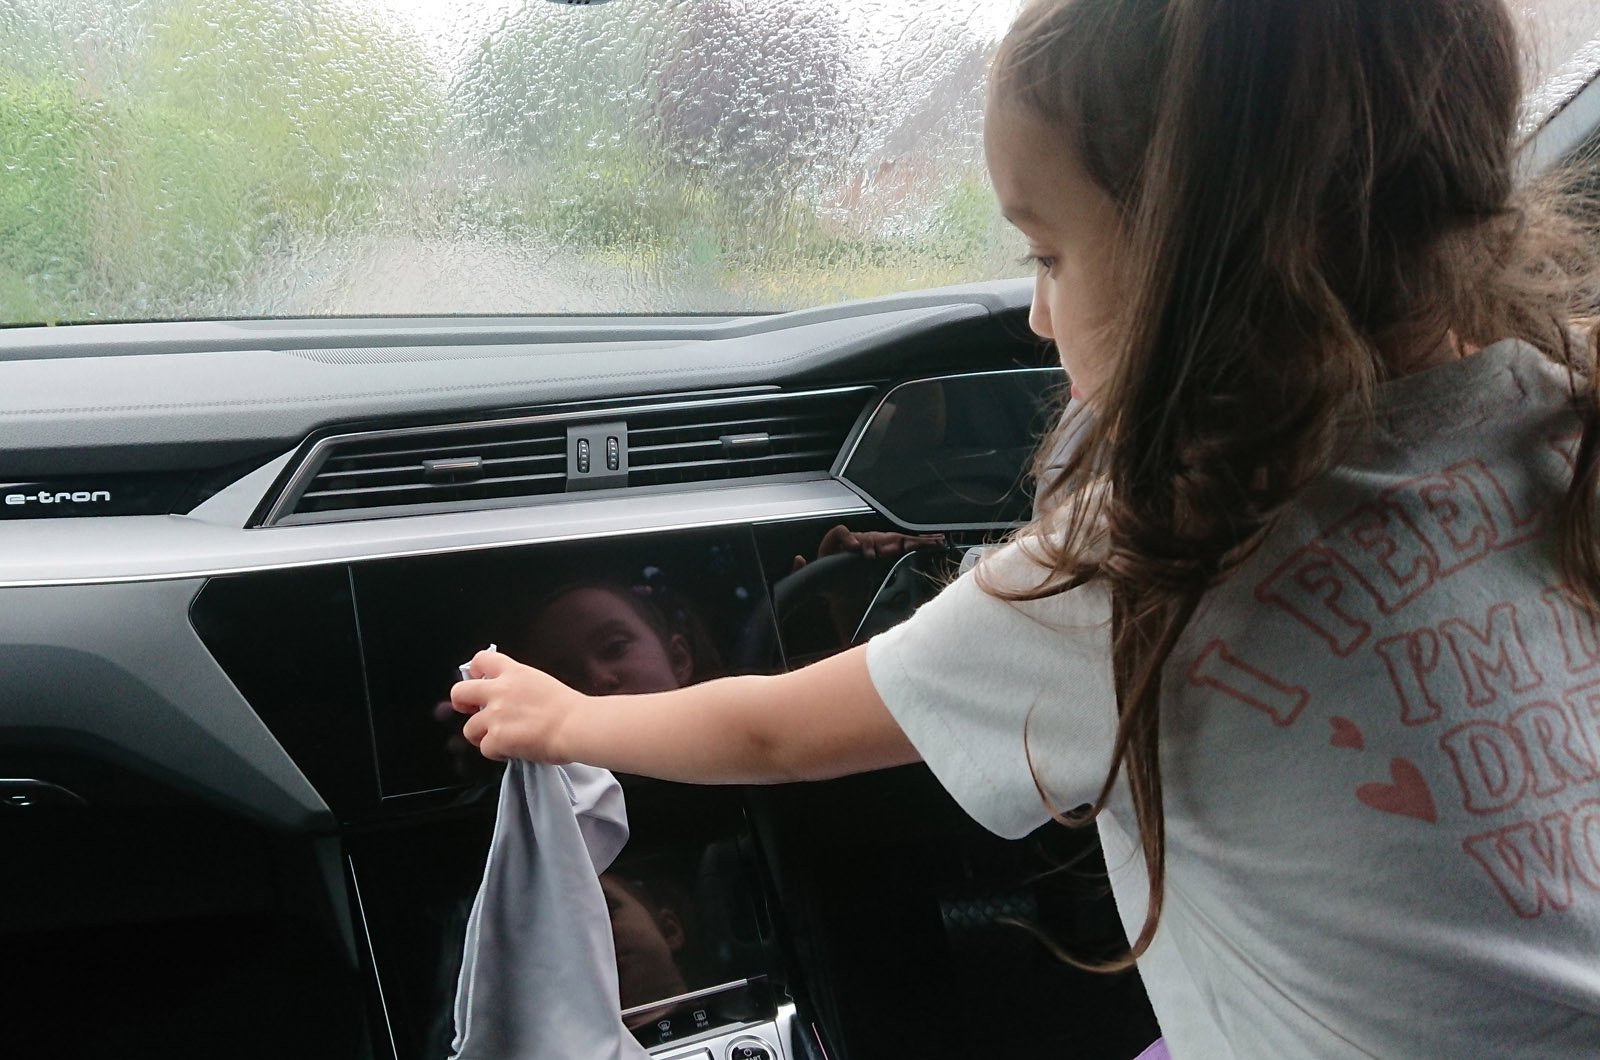 LT Audi E-tron Sportback - cleaning touchscreen